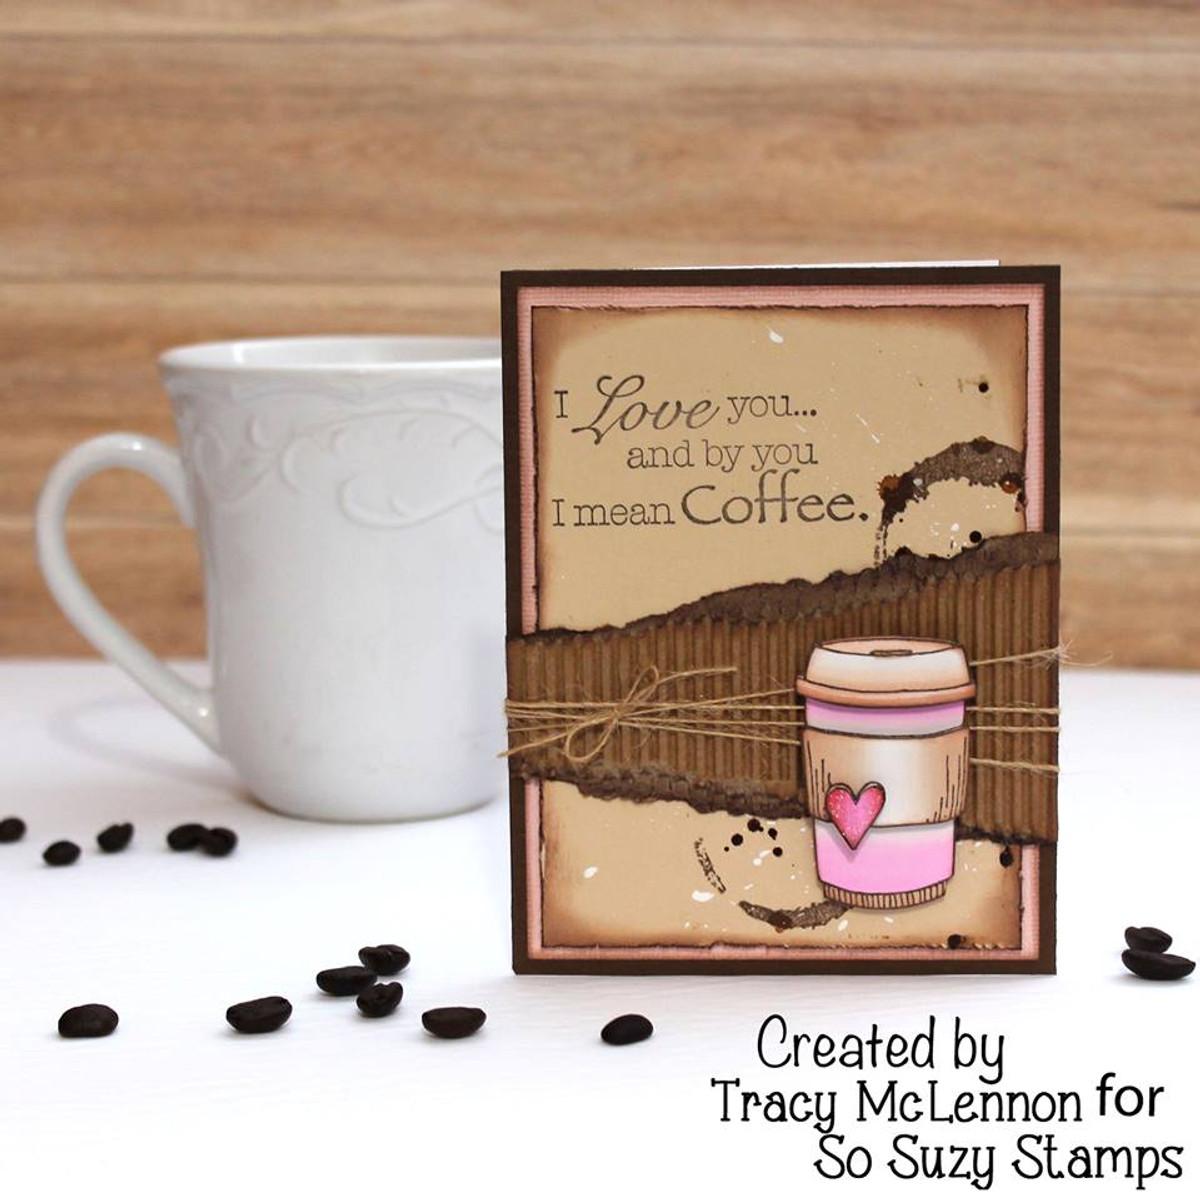 Lummy Coffee Cup Heart Coffee Cup Heart Coffee Cup Heart Coffee Cup Heart So Suzy Stamps Coffee Cup Heart Vector Coffee Cup Heart Drawing furniture Coffee Cup Heart